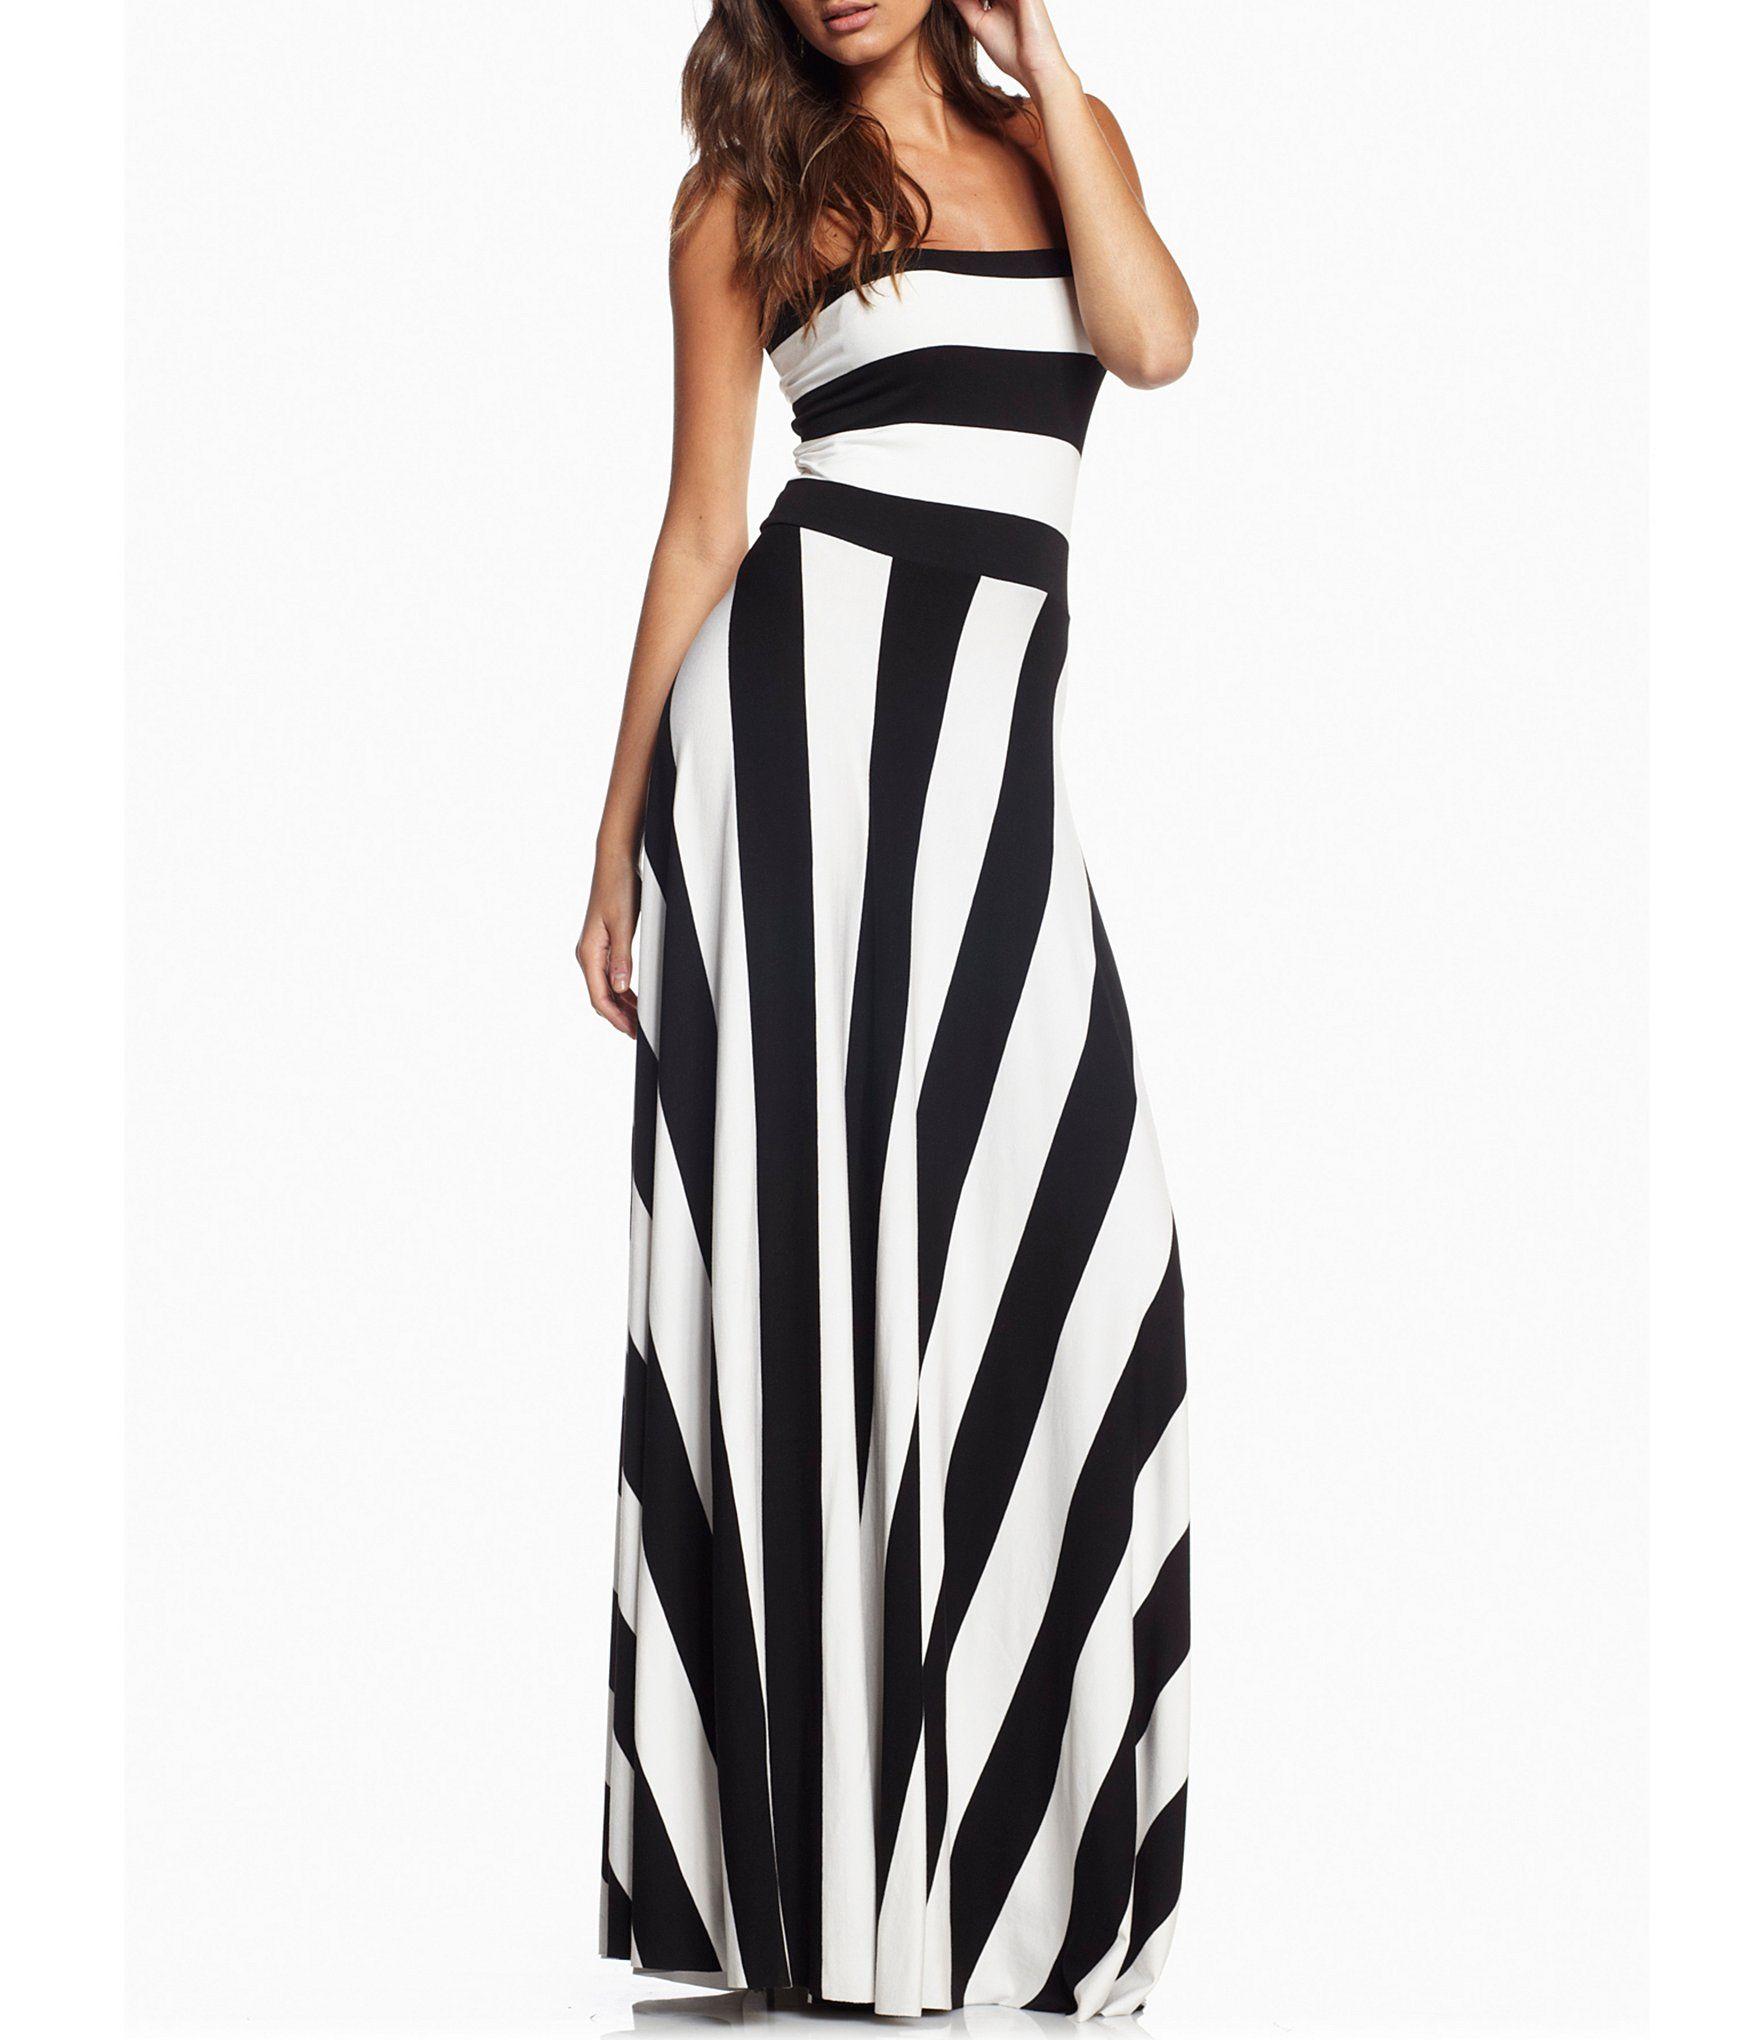 Elan Stripe Convertible Strapless Maxi Dress Dillard S In 2021 Black White Maxi Dress Maxi Dress Spring Maxi Dress [ 2040 x 1760 Pixel ]